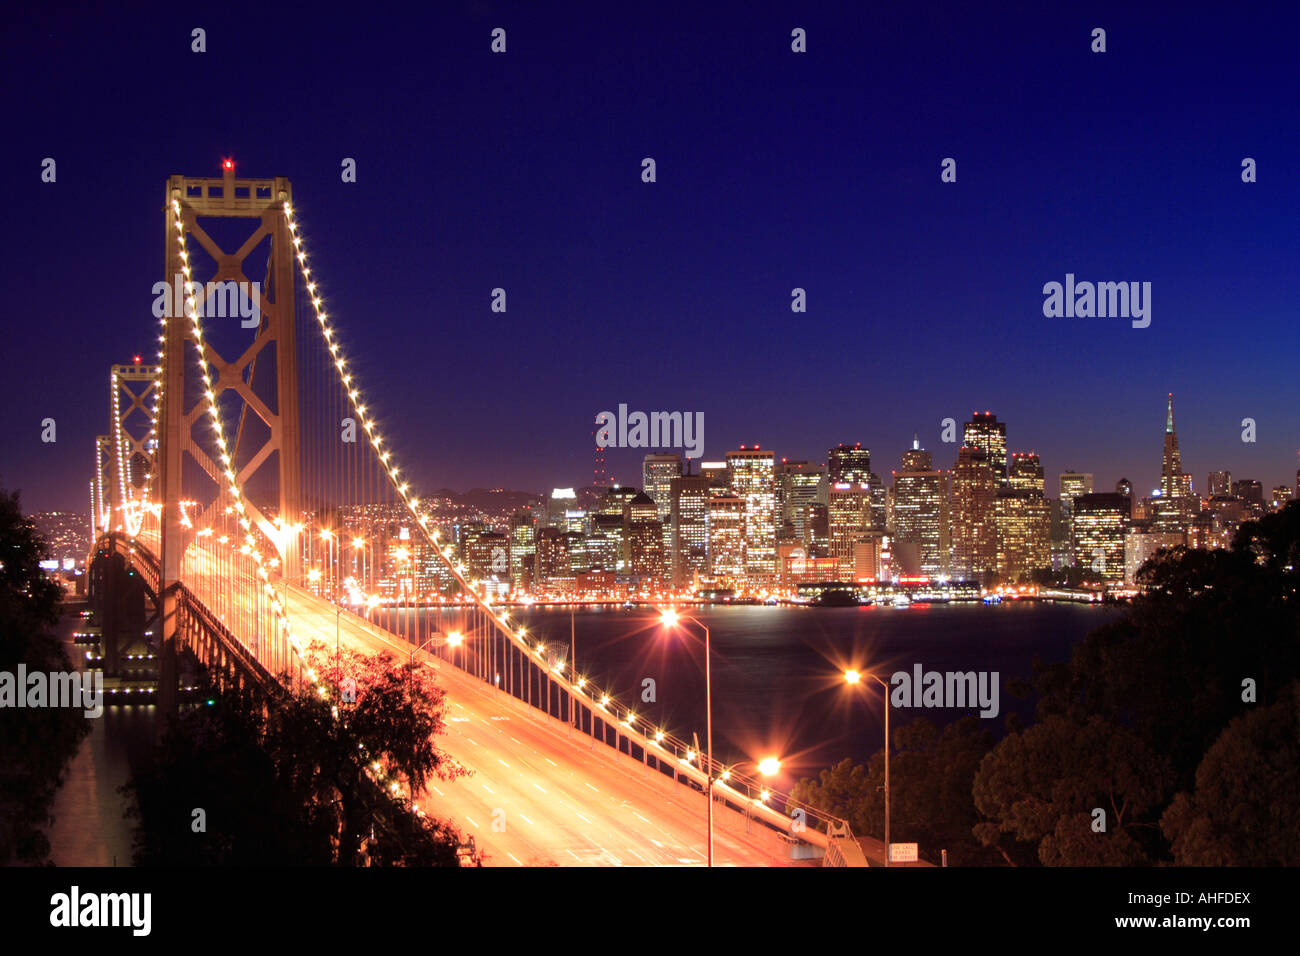 Oakland Bay Bridge at night, San Francisco Stock Photo